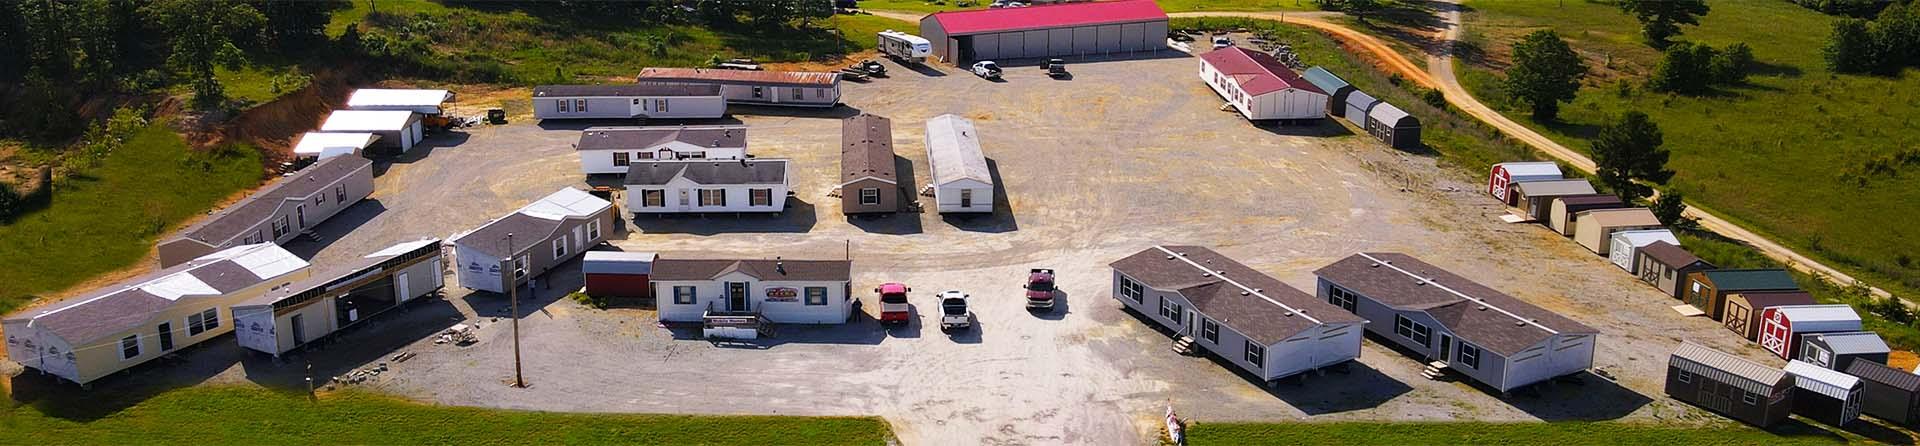 Von Allmen Mobile Homes, New Storage Sheds, Portable Buildings, Carports